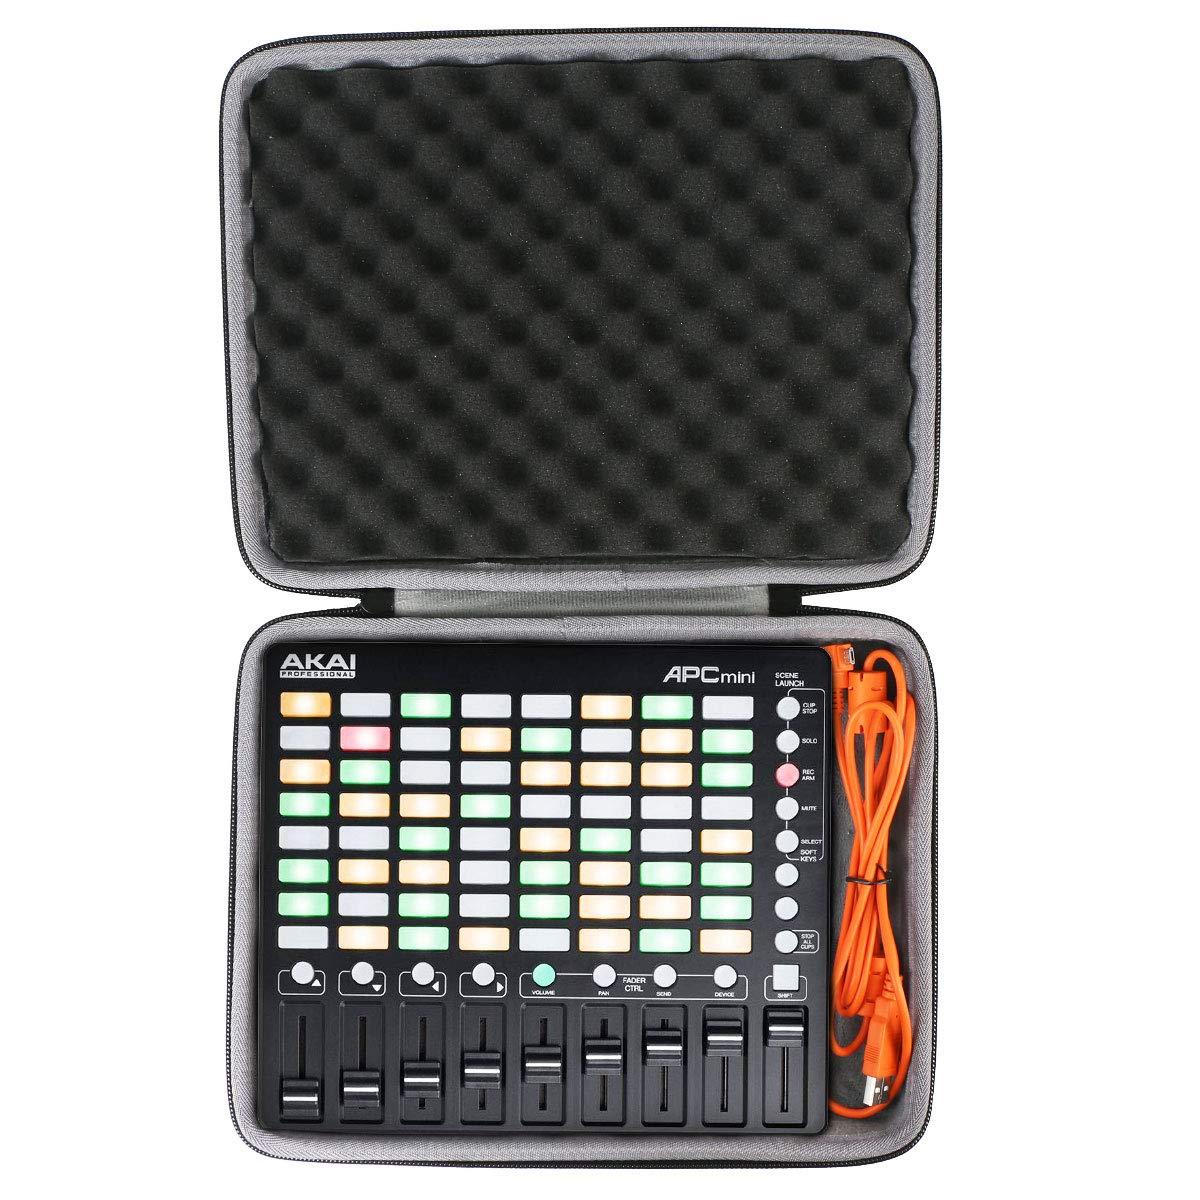 co2crea Hard Travel Case for Akai Professional APC Mini | Compact Ableton Live controller